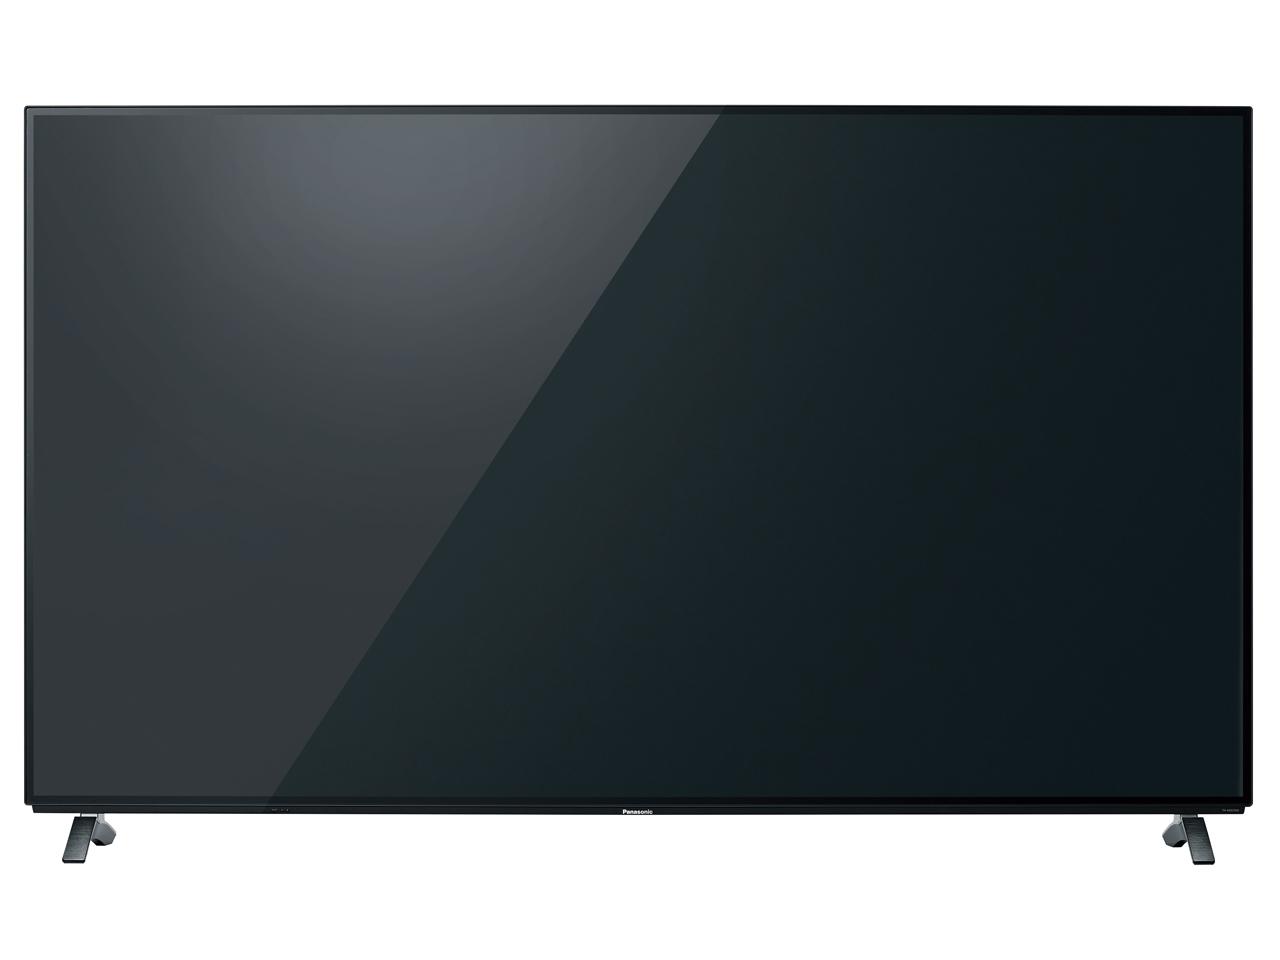 VIERA TH-65EZ950 [65インチ] の製品画像